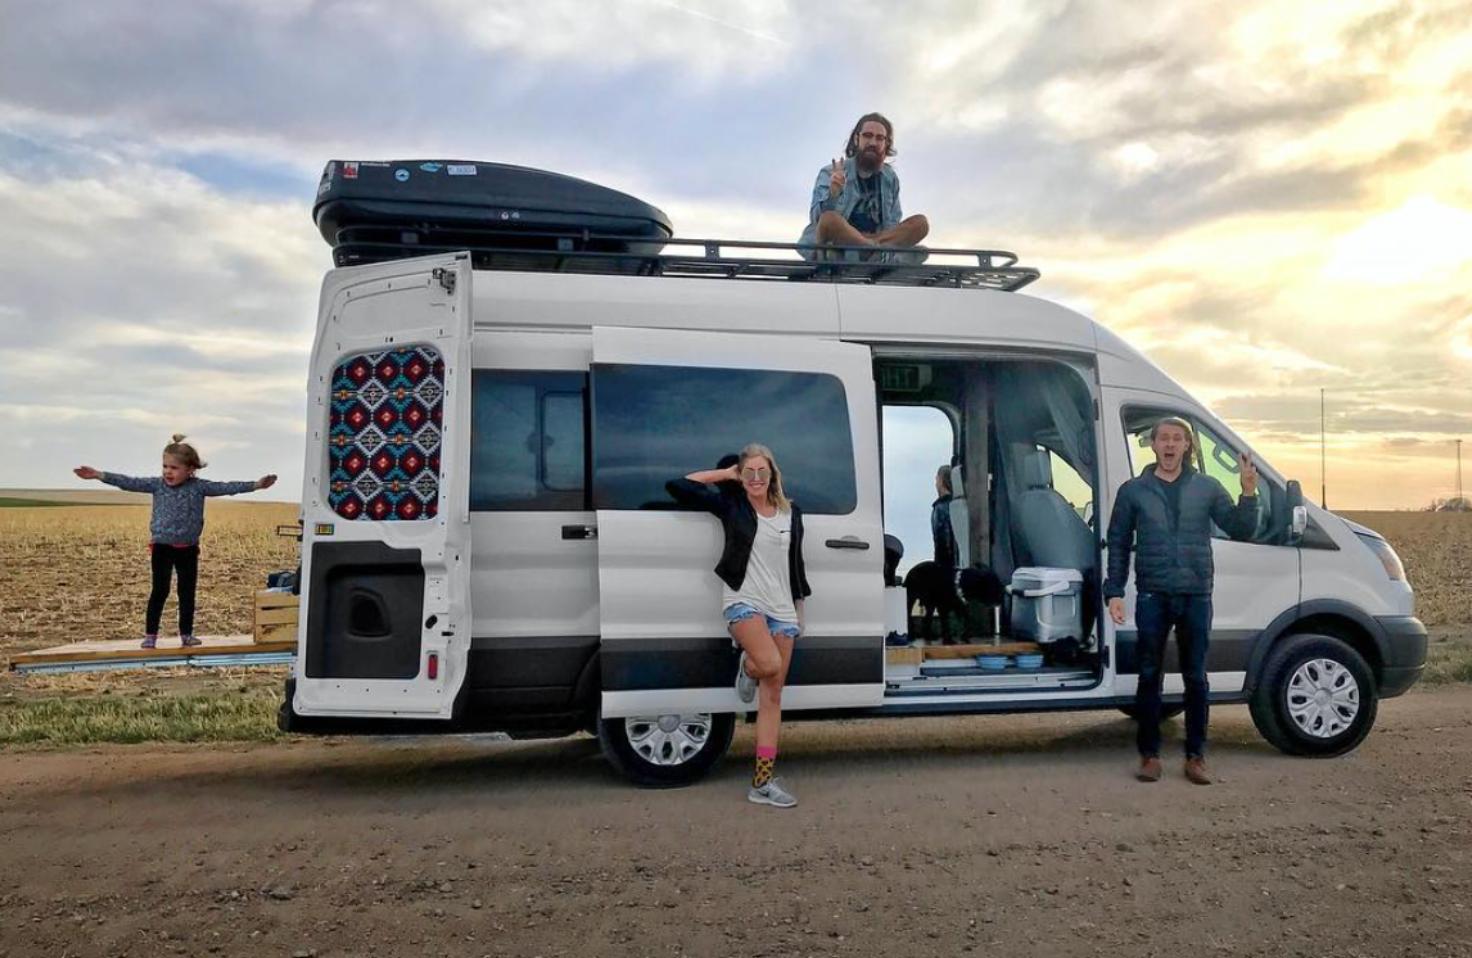 Ford_Transit_Camper_Van